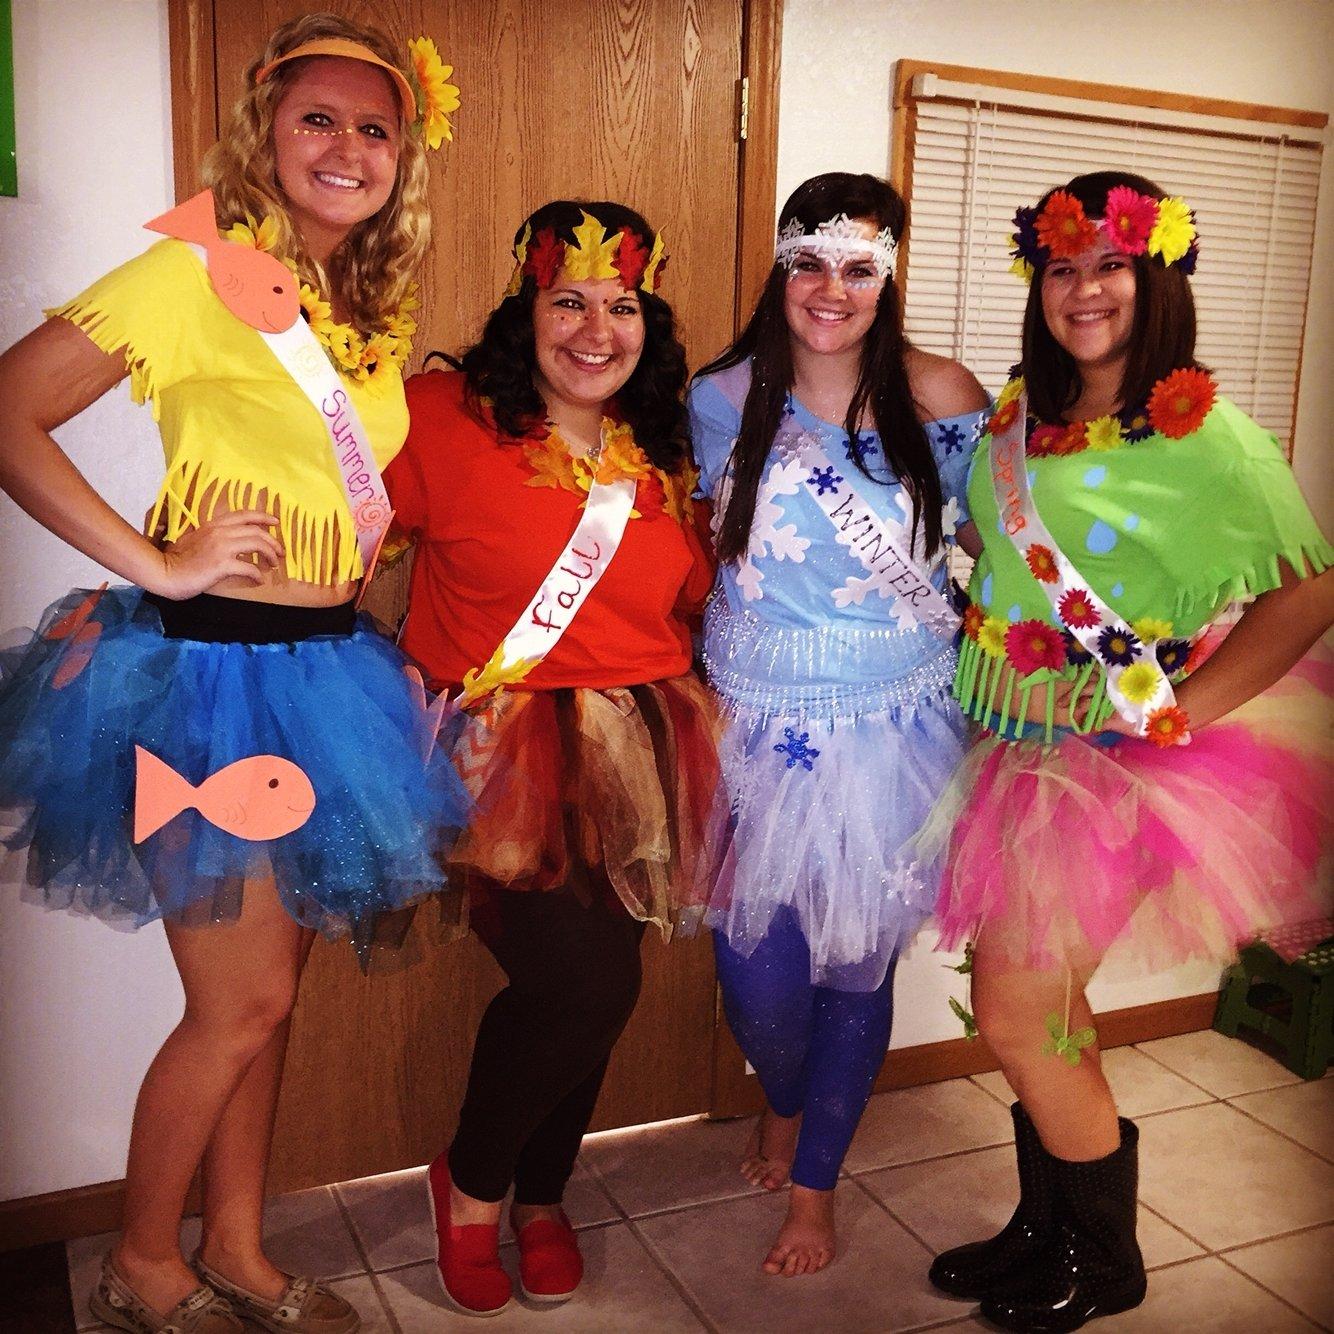 halloween costumes for 3 friends google search. best halloween